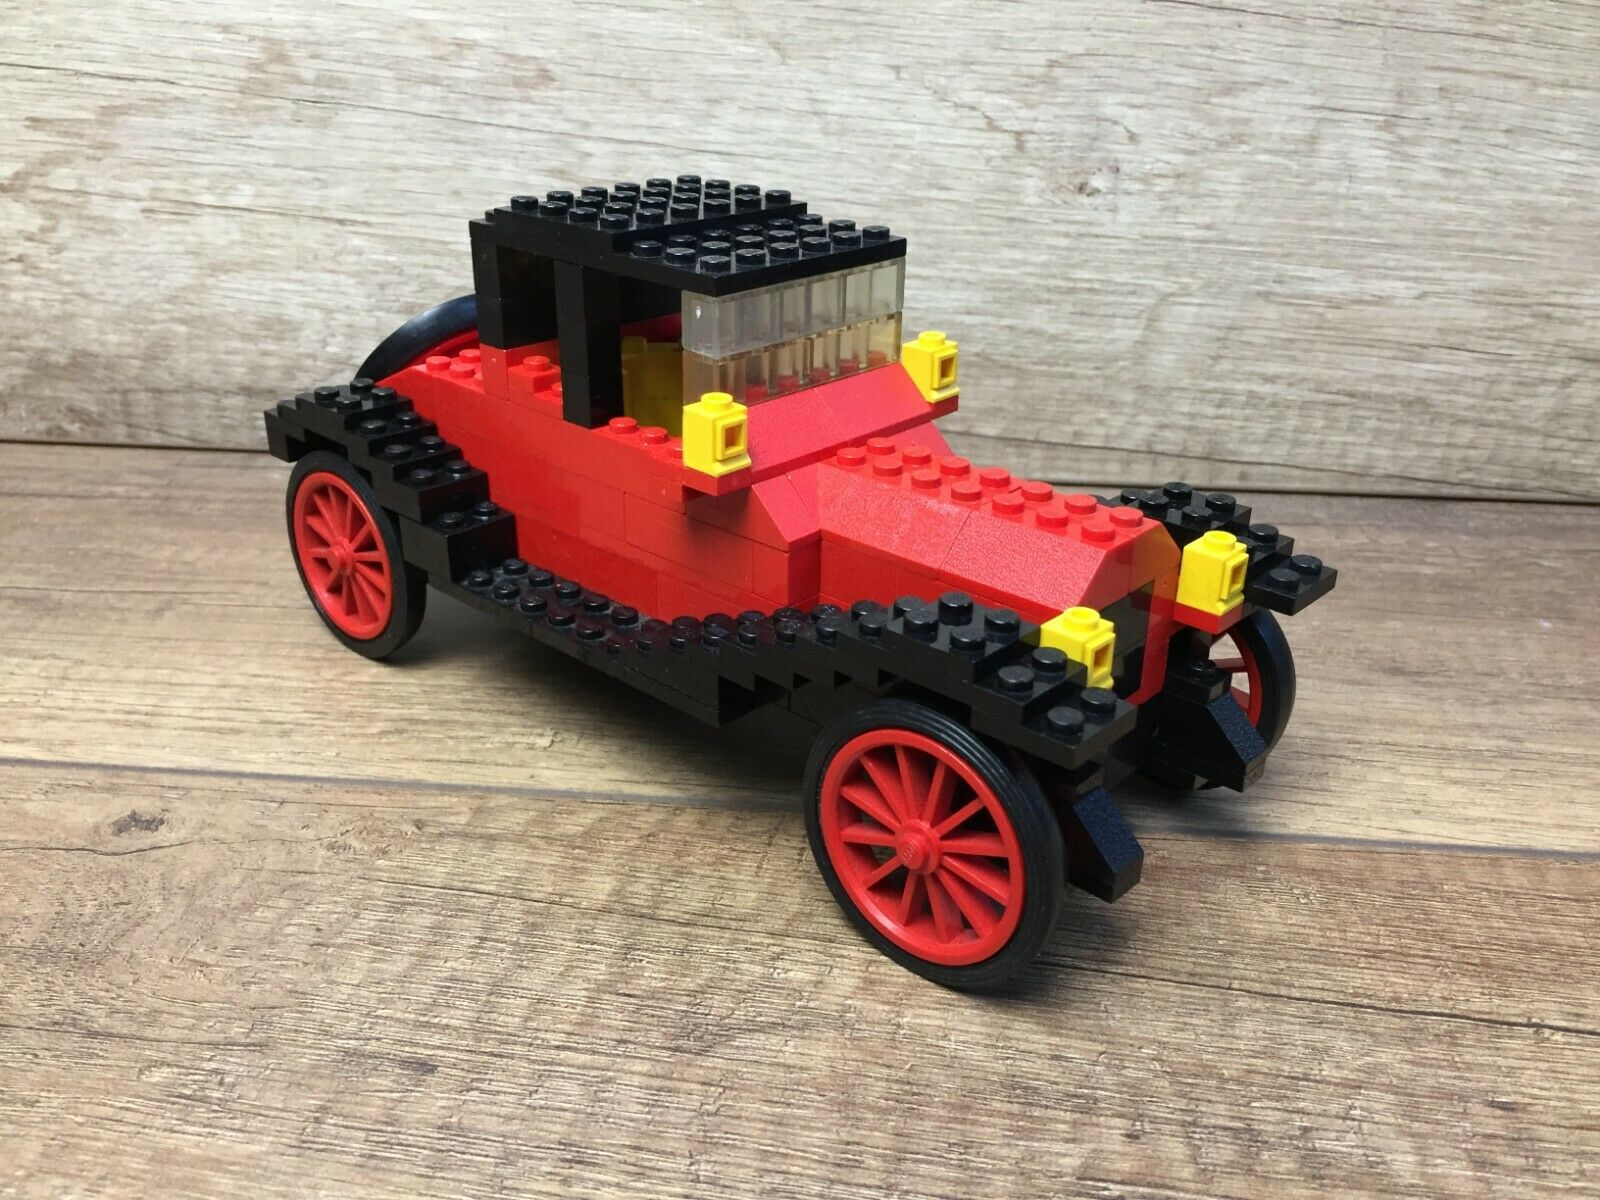 Lego 390 CADILLAC 1913 LEGO Hobby Sets VILLE  CITY Town  achats de mode en ligne